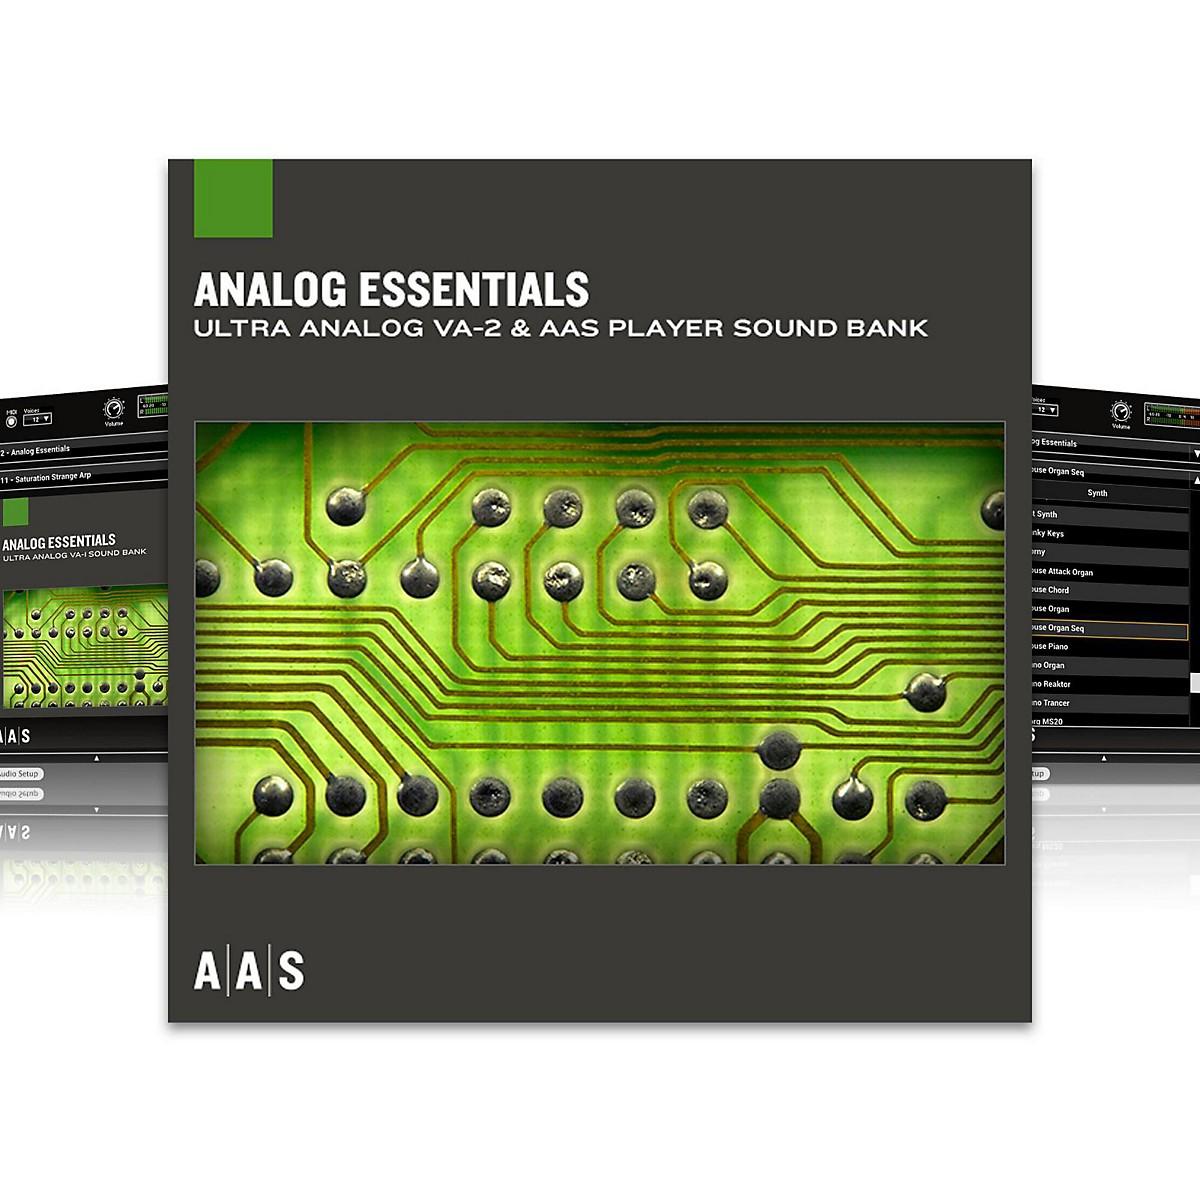 Applied Acoustics Systems Sound Bank Series Ultra Analog VA-2 - Analog Essentials